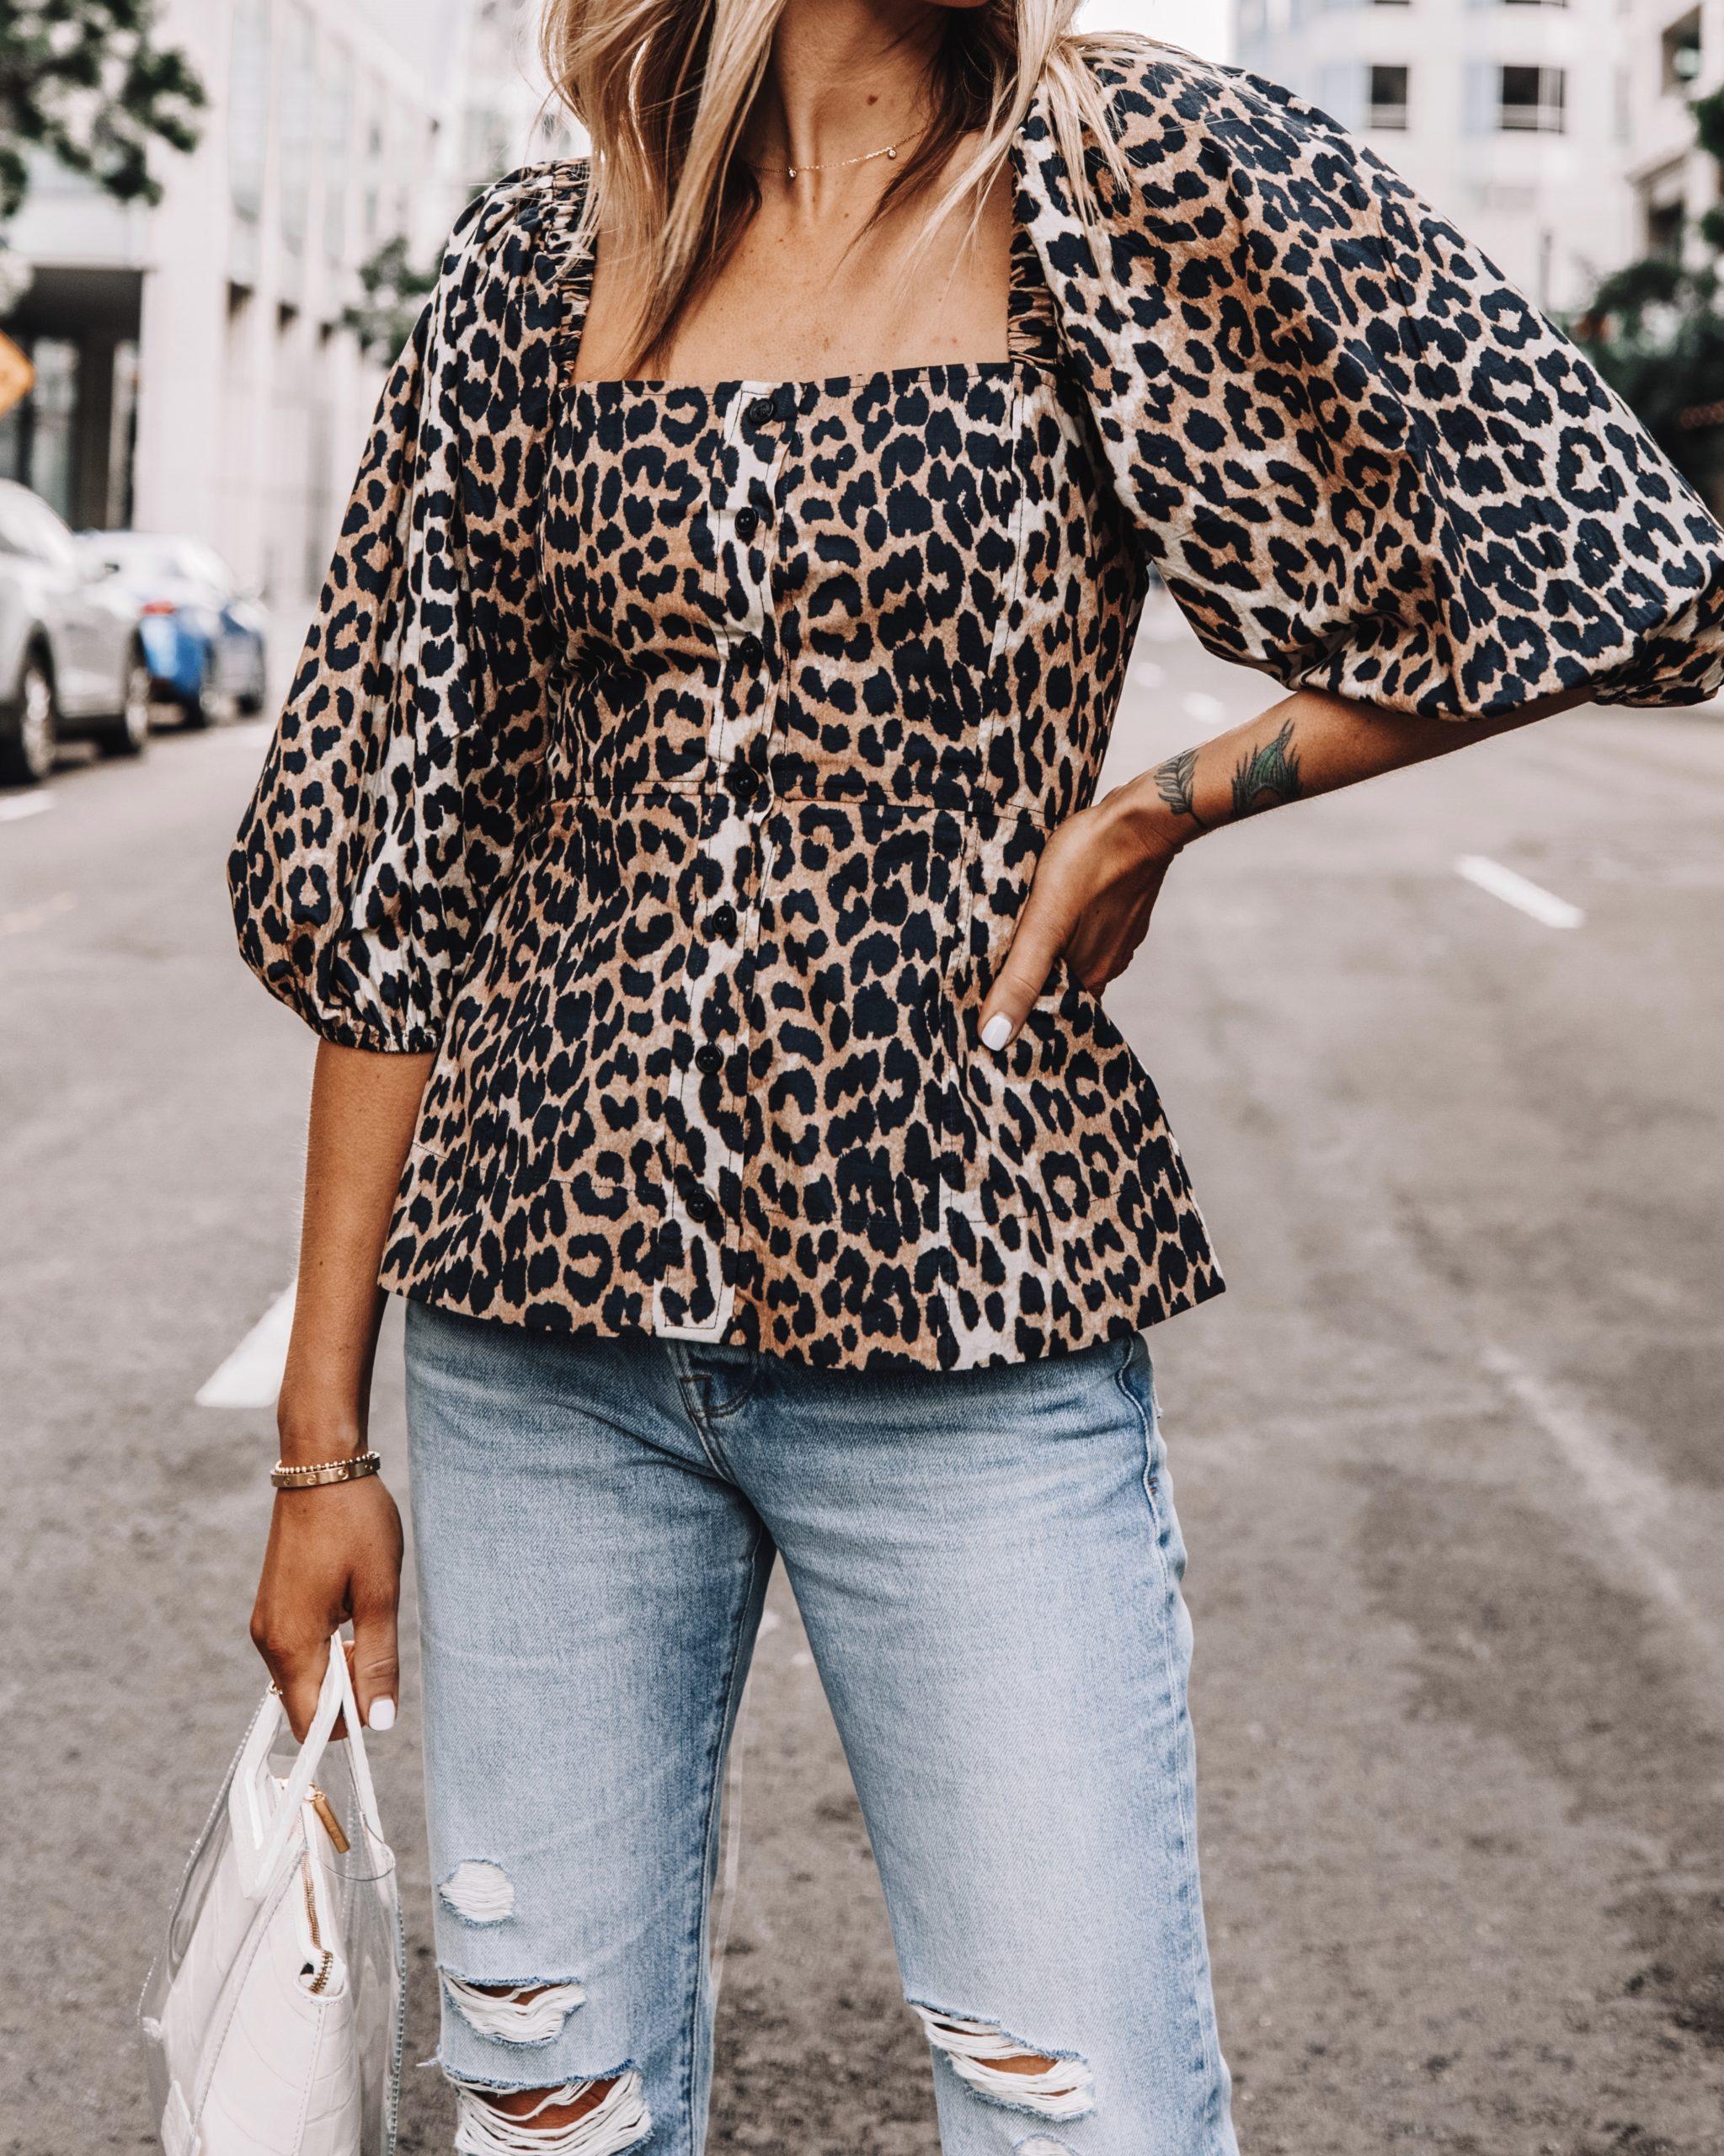 Fashion Jackson Wearing Ganni Leopard Top Ripped Jeans